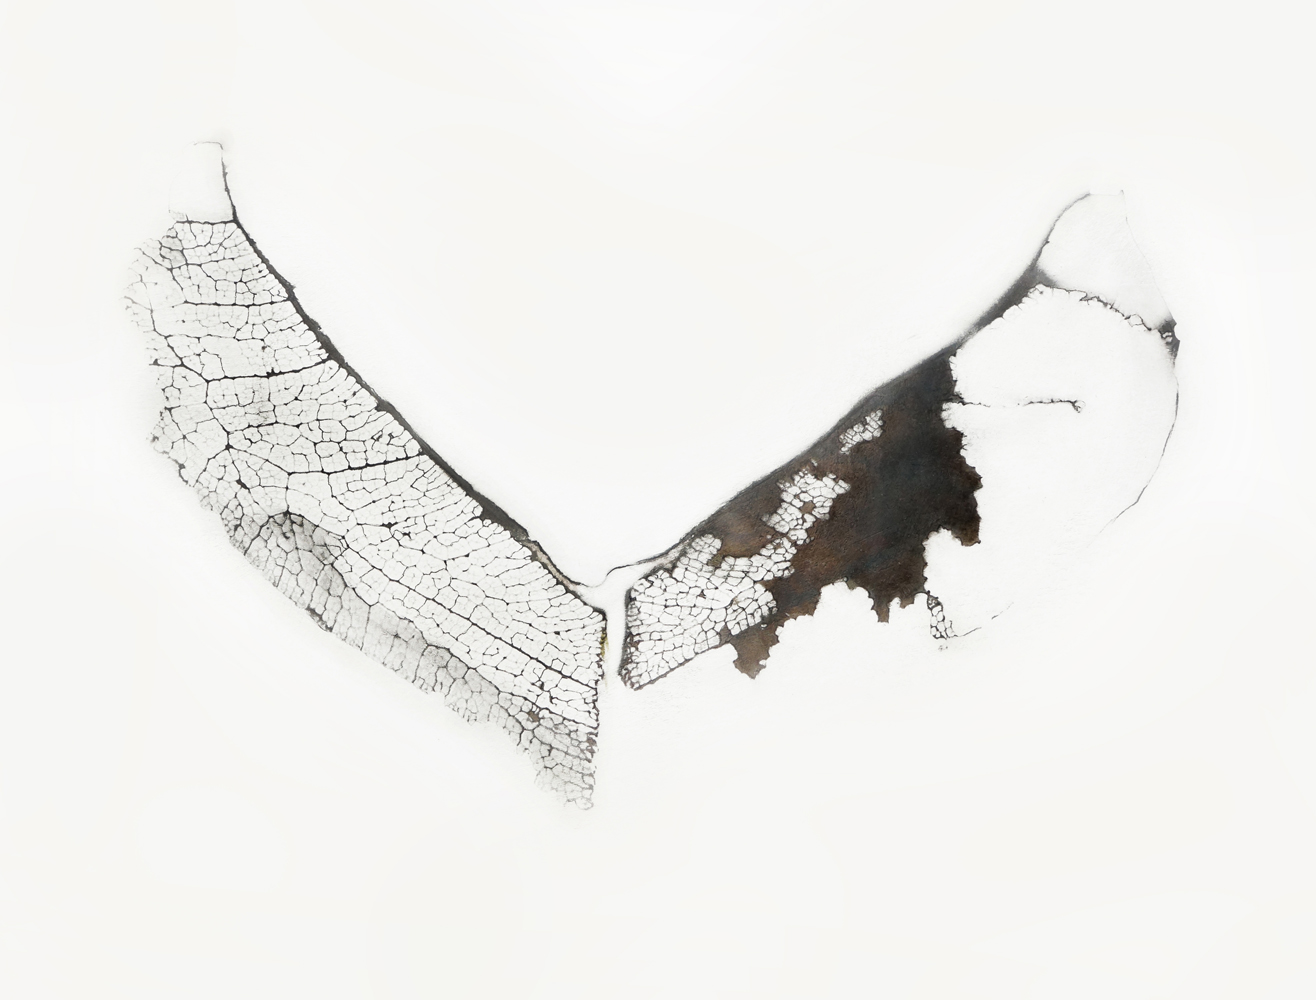 Untitled #10 , 2015, Graphite on prepared paper, 8.5 x 11 inches